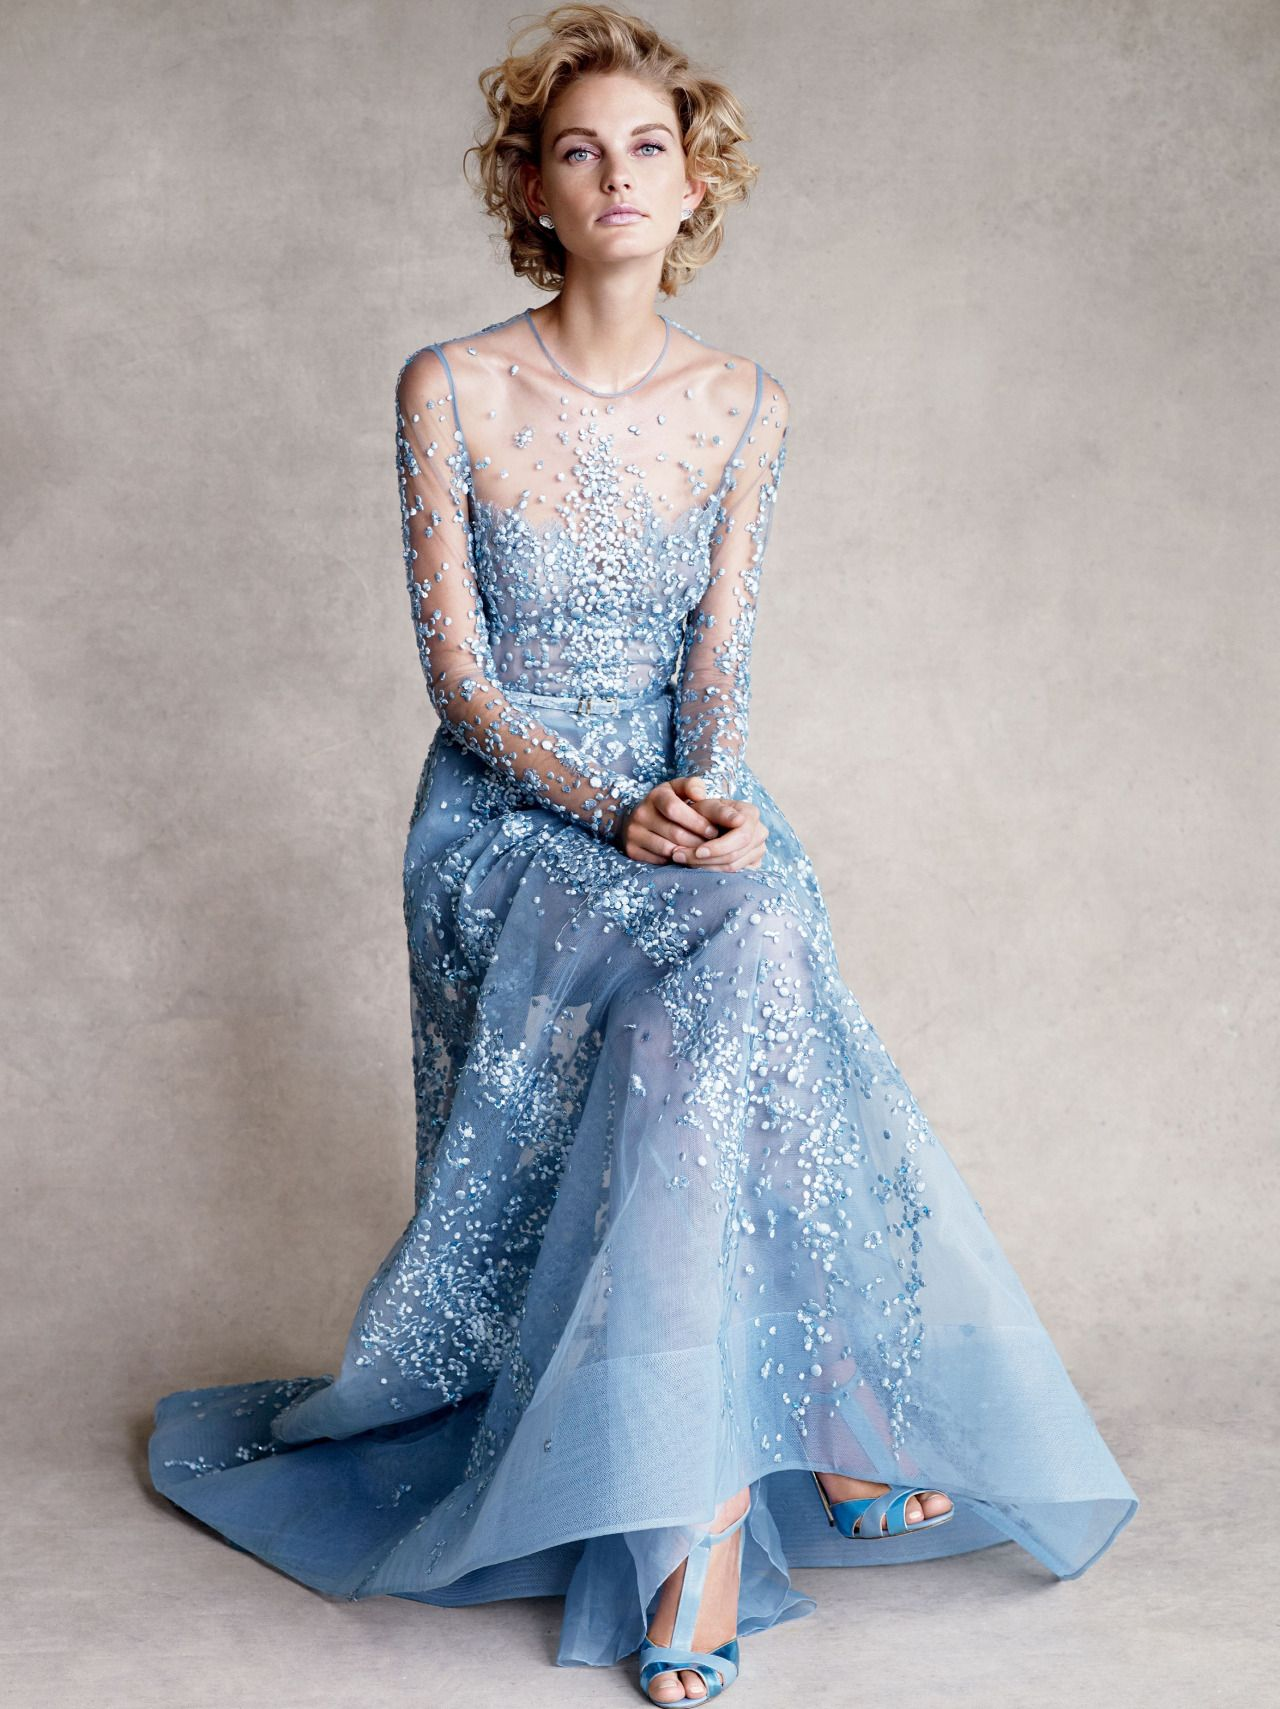 fairy tale dress, designer dress, editorial, fashion photography ...